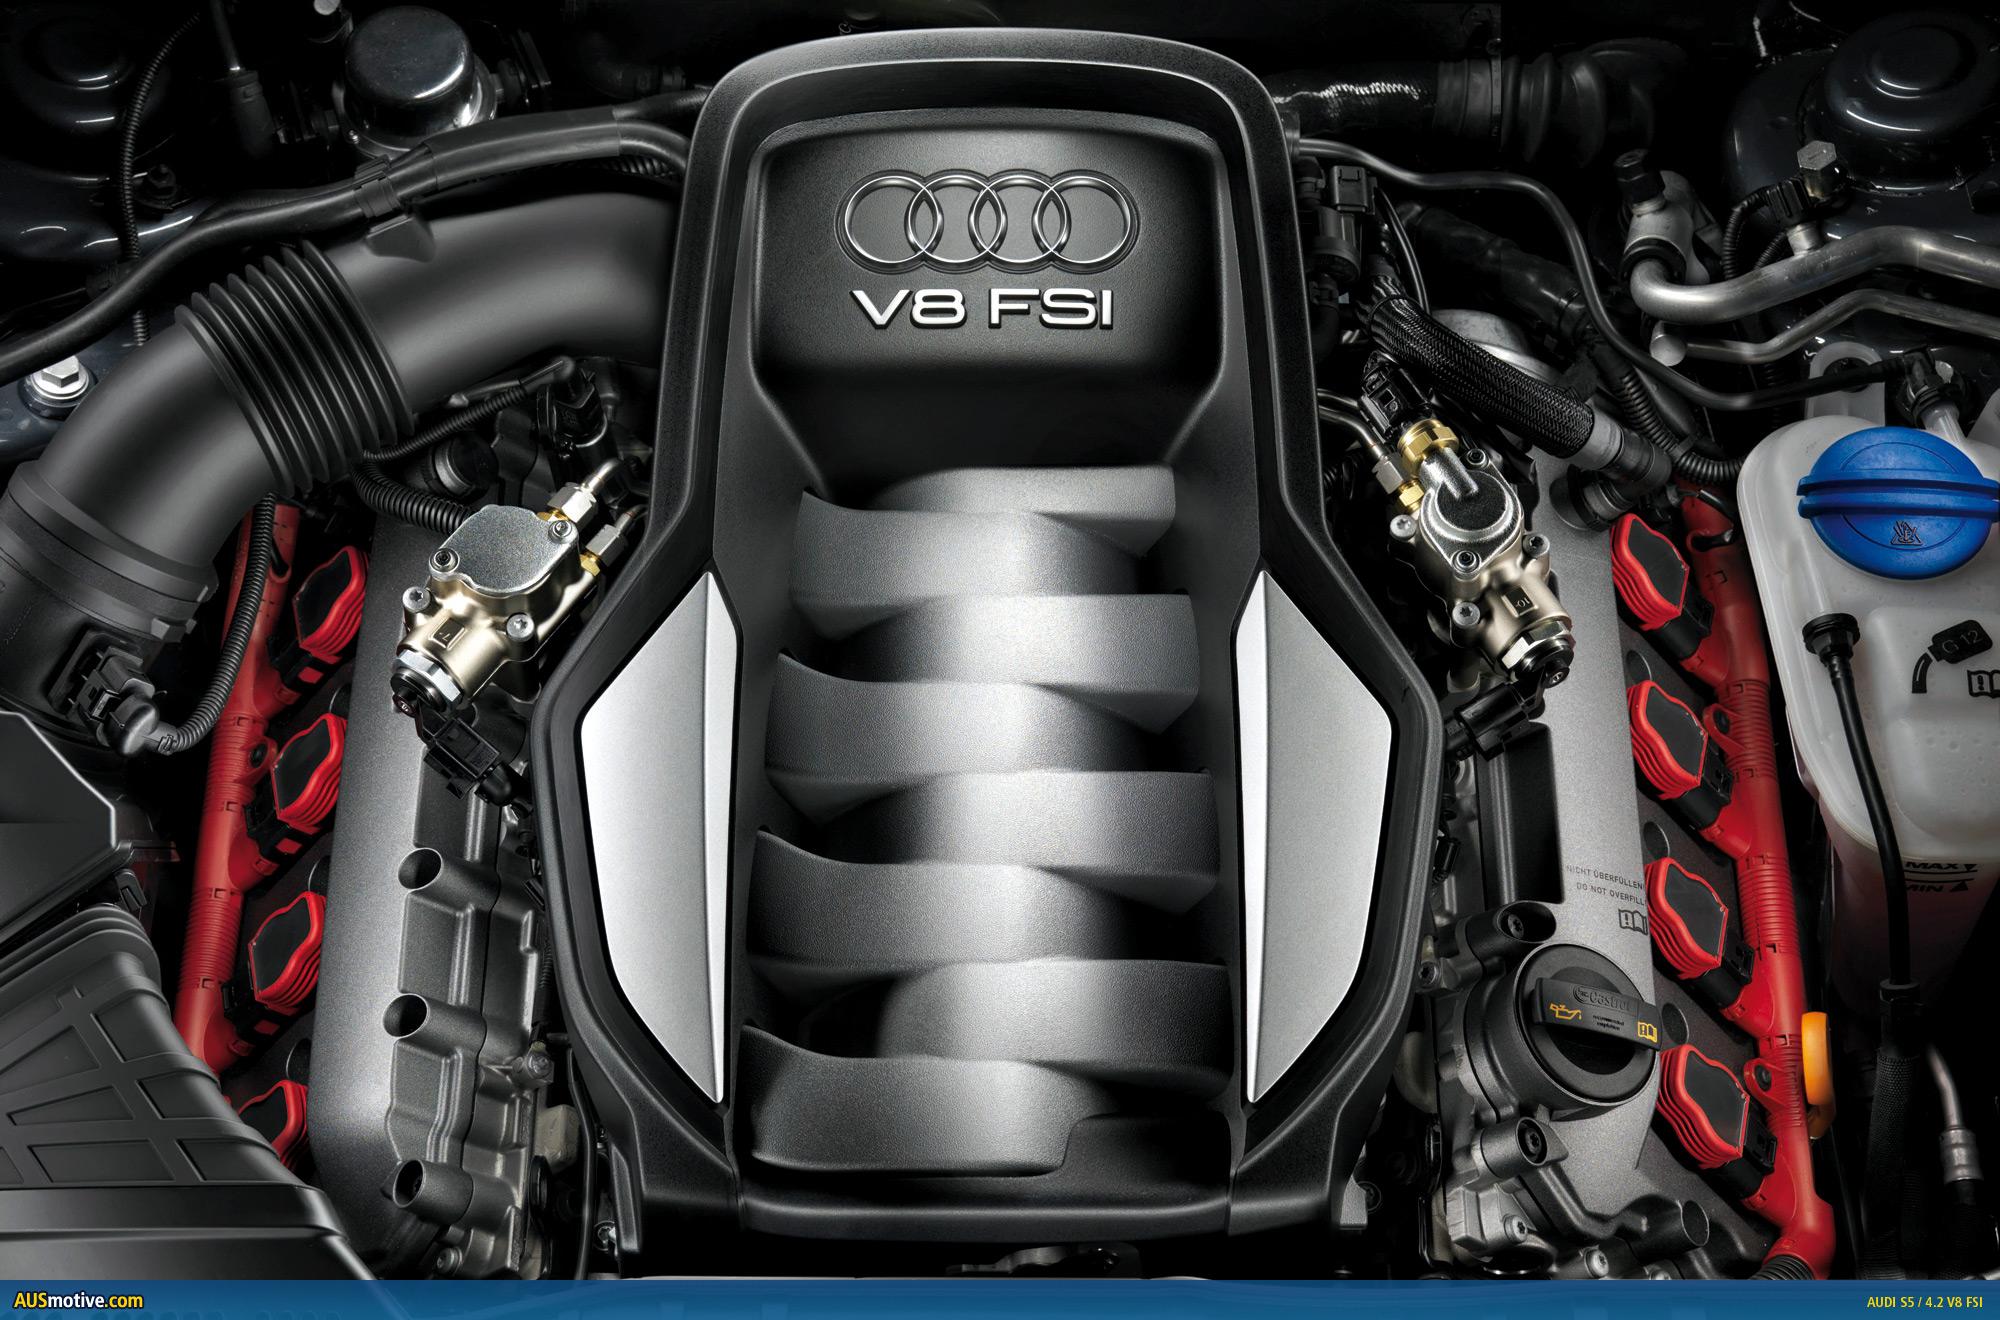 Audi S5 4.2 V8 FSI